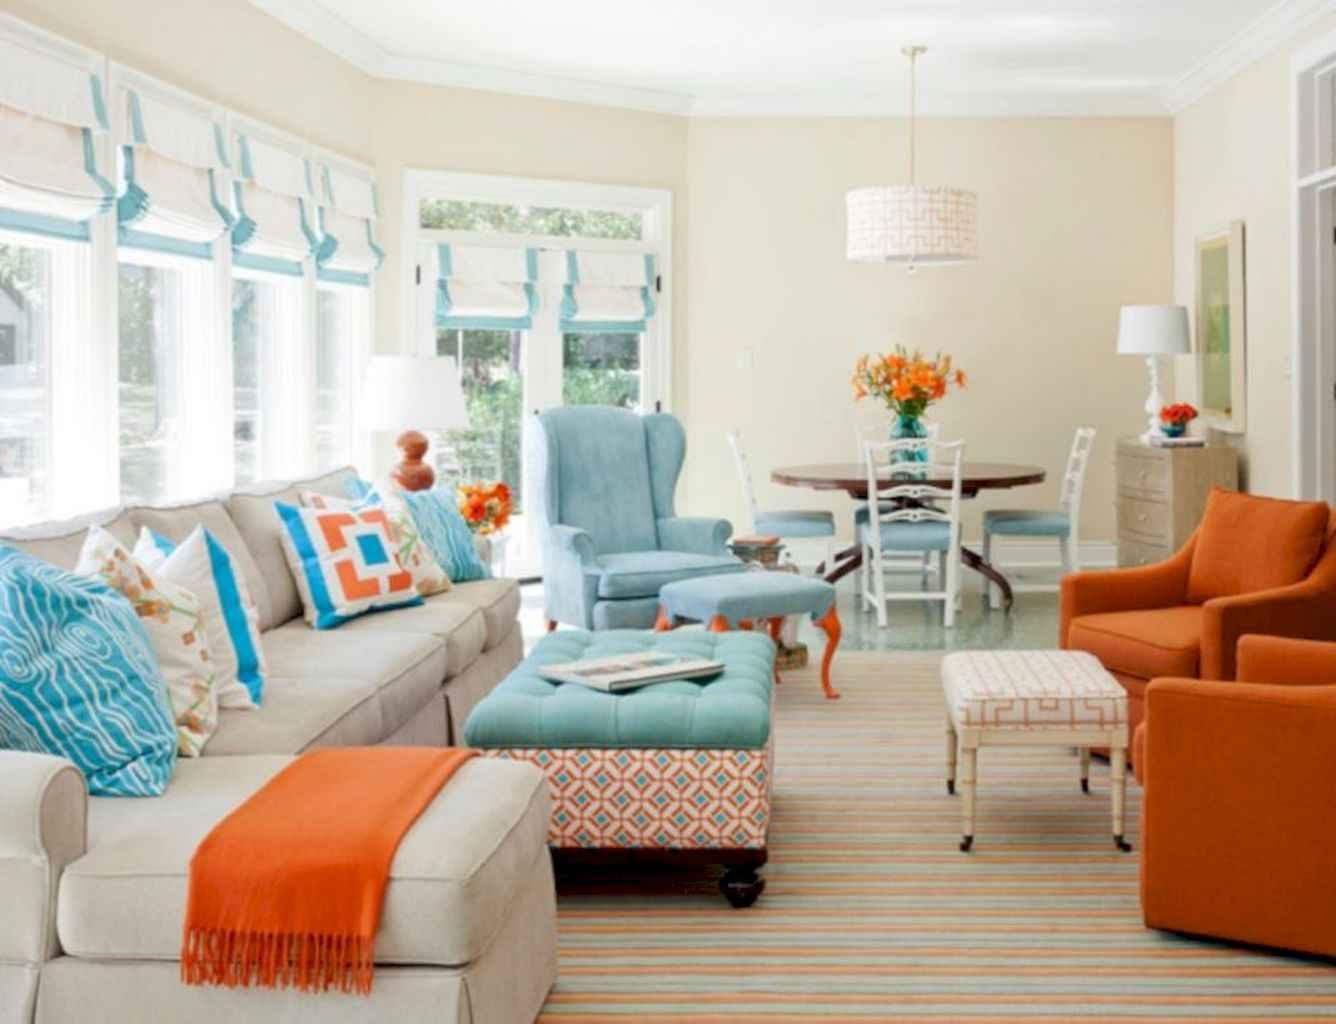 80 Elegant Harmony Interior Design Ideas For First Couple (58)